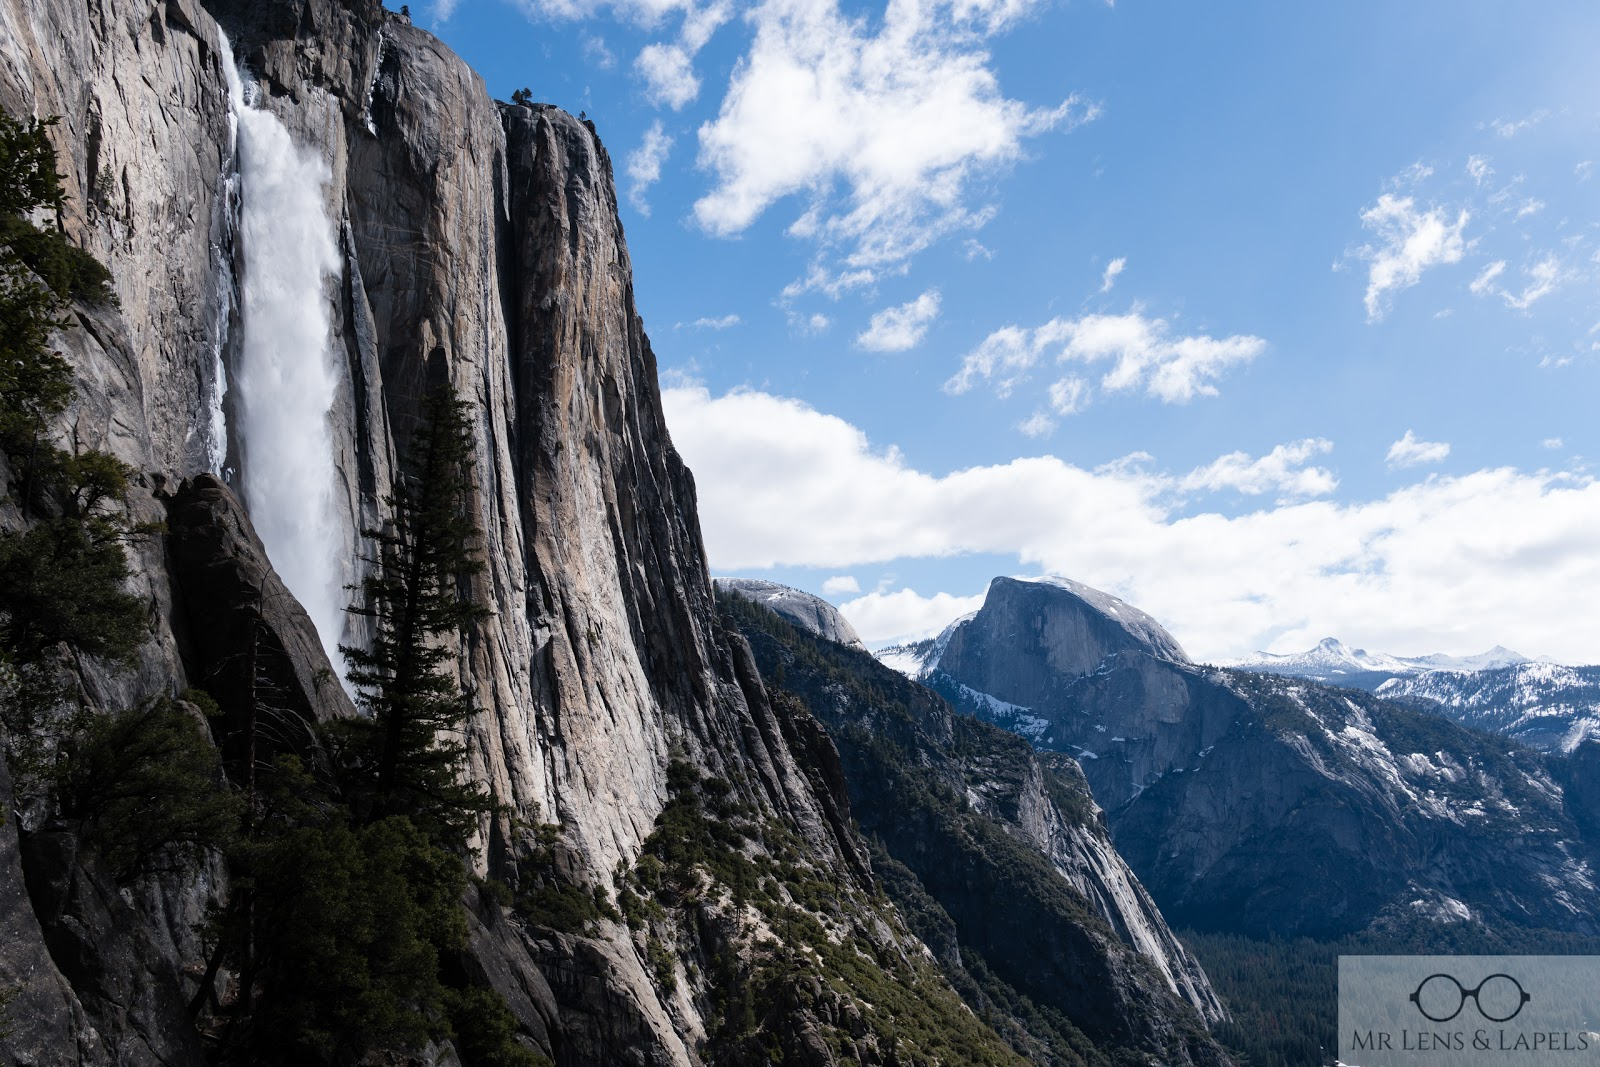 Yosemite national park upper yosemite falls